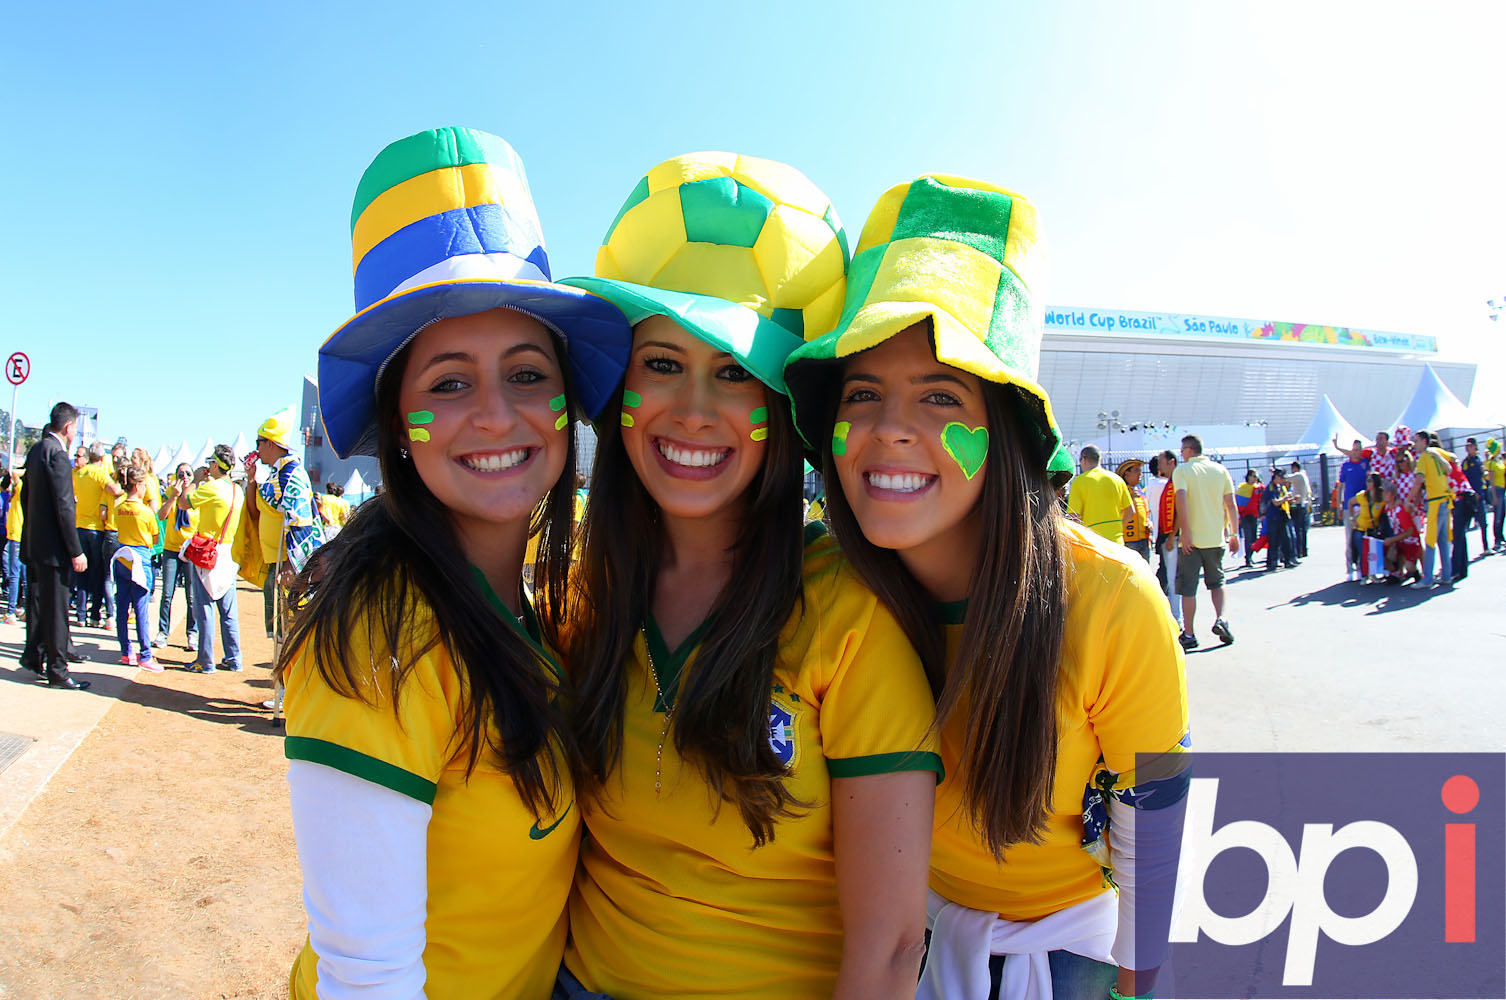 BPI_KM_BRAZIL_CROATIA_120614_013